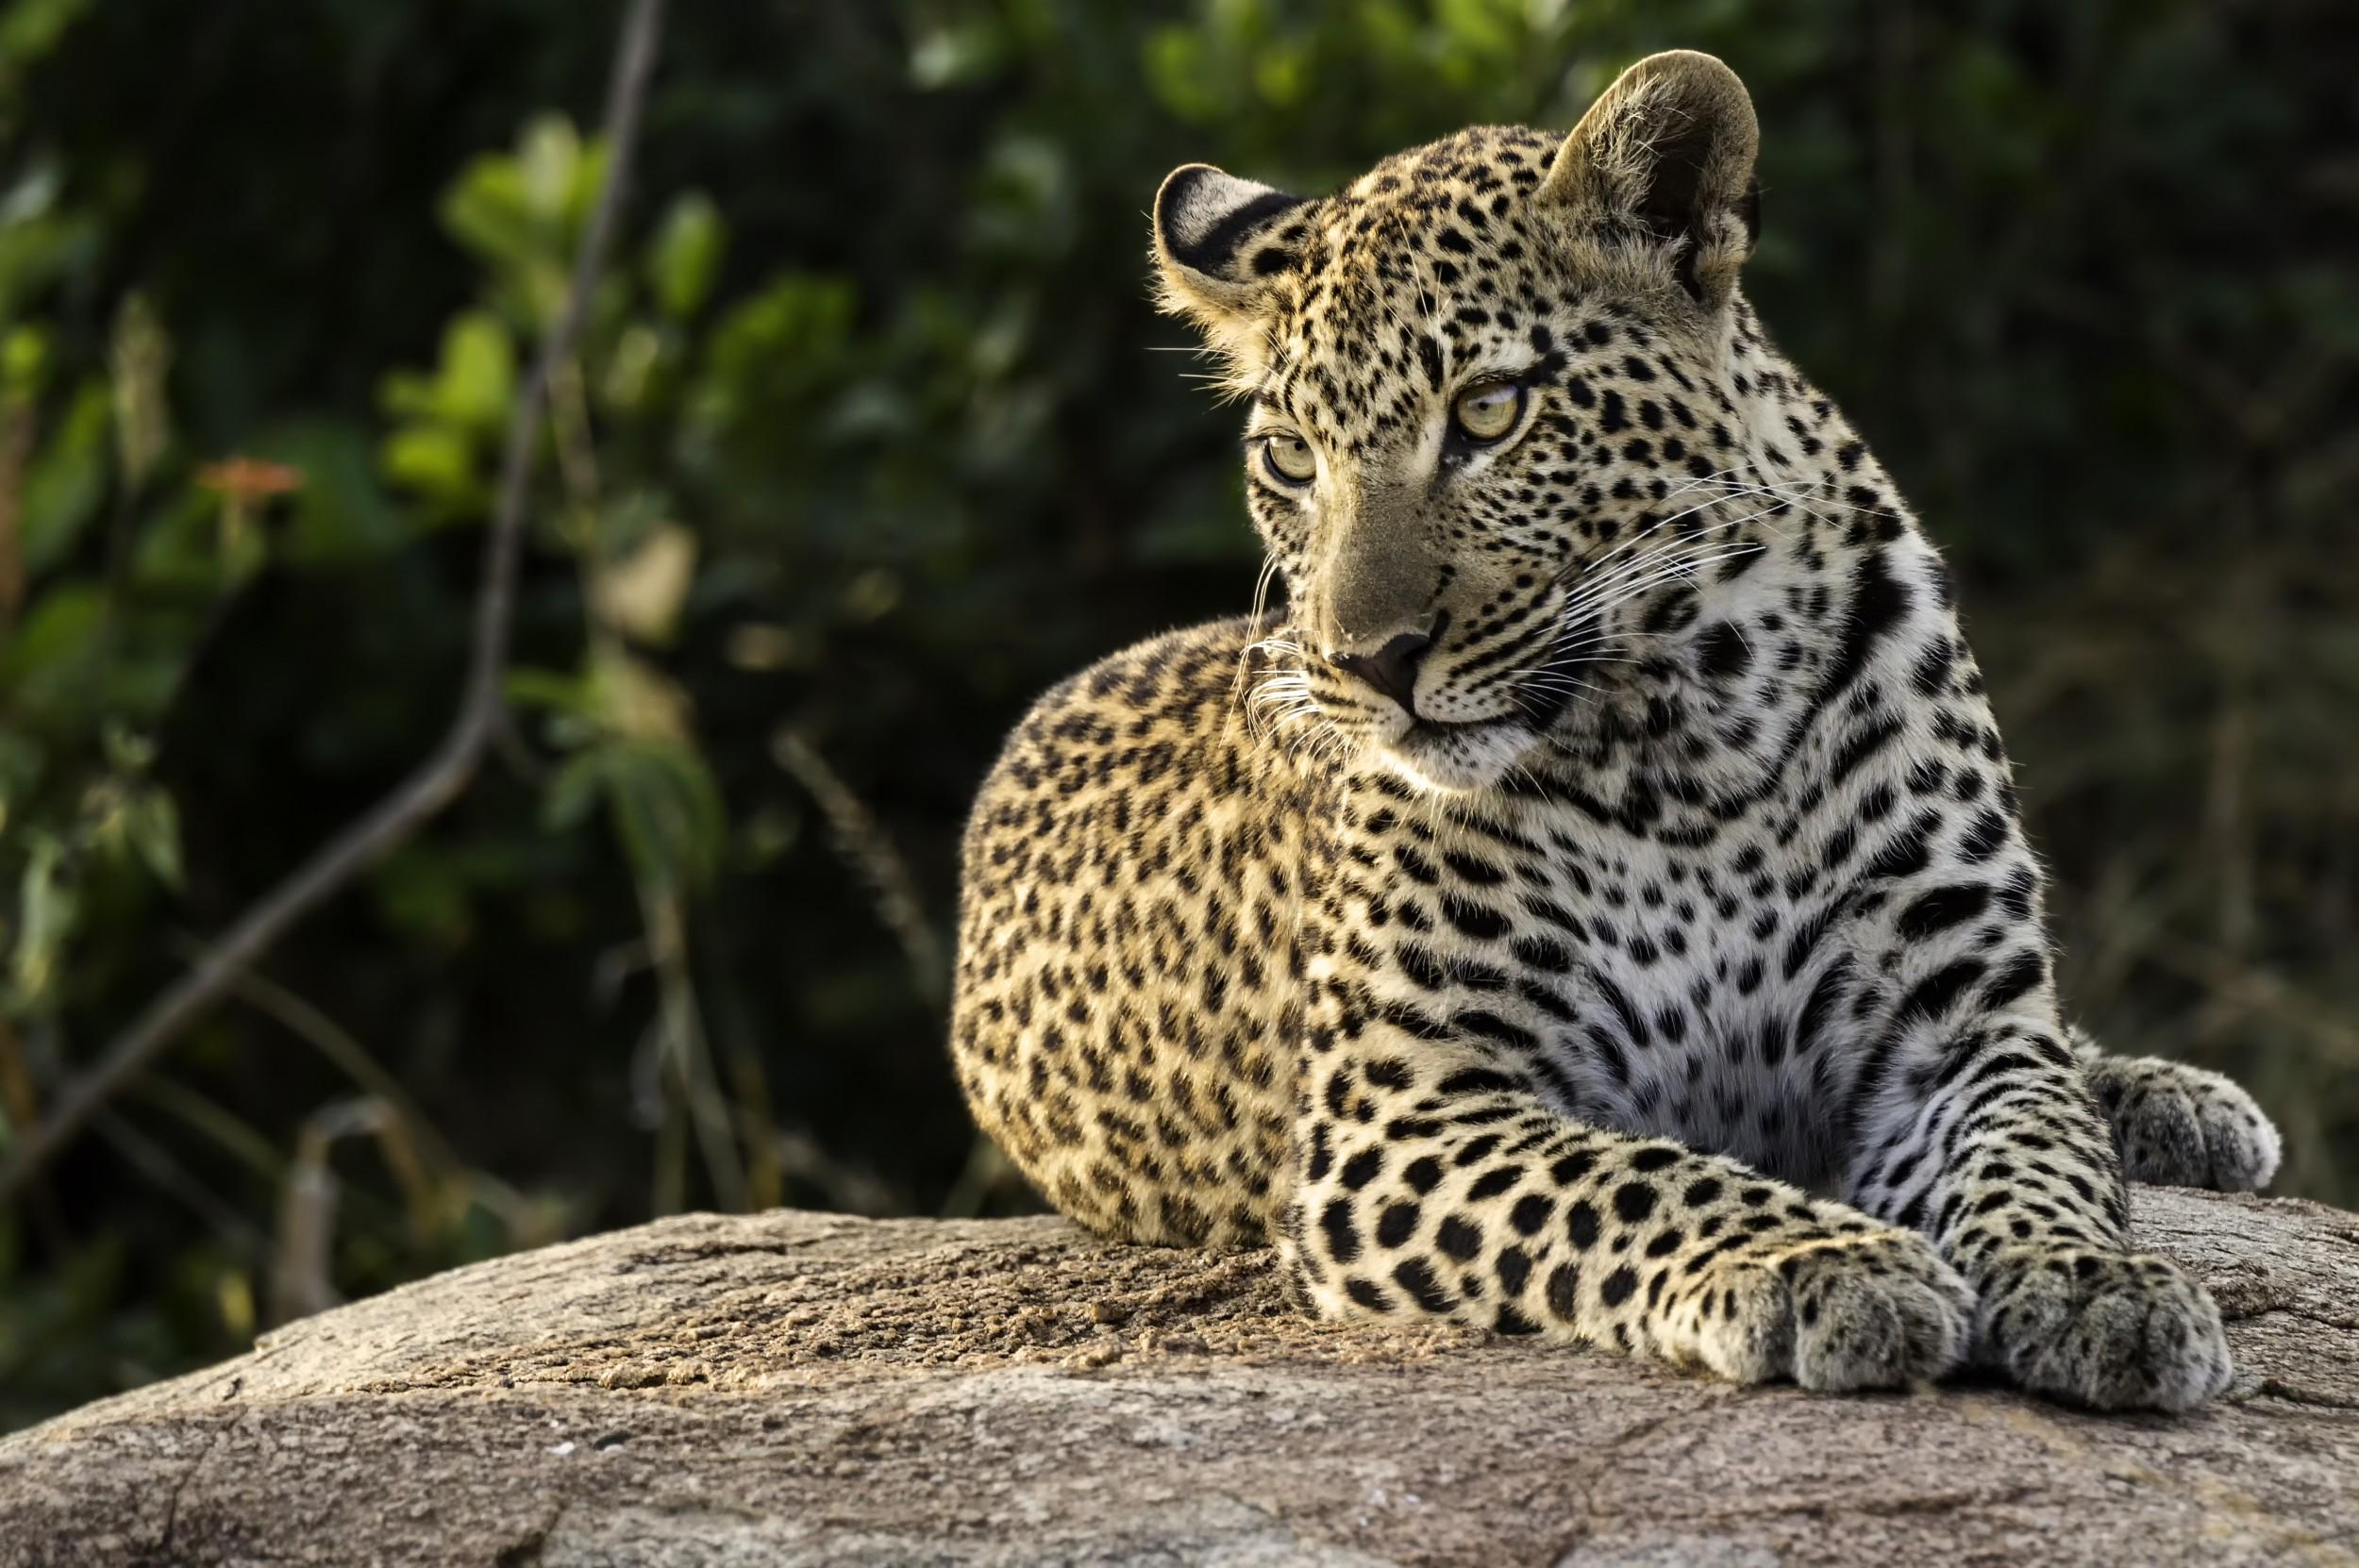 Leopardo ecologia caracter sticas fotos infoescola - Para ver fotos ...